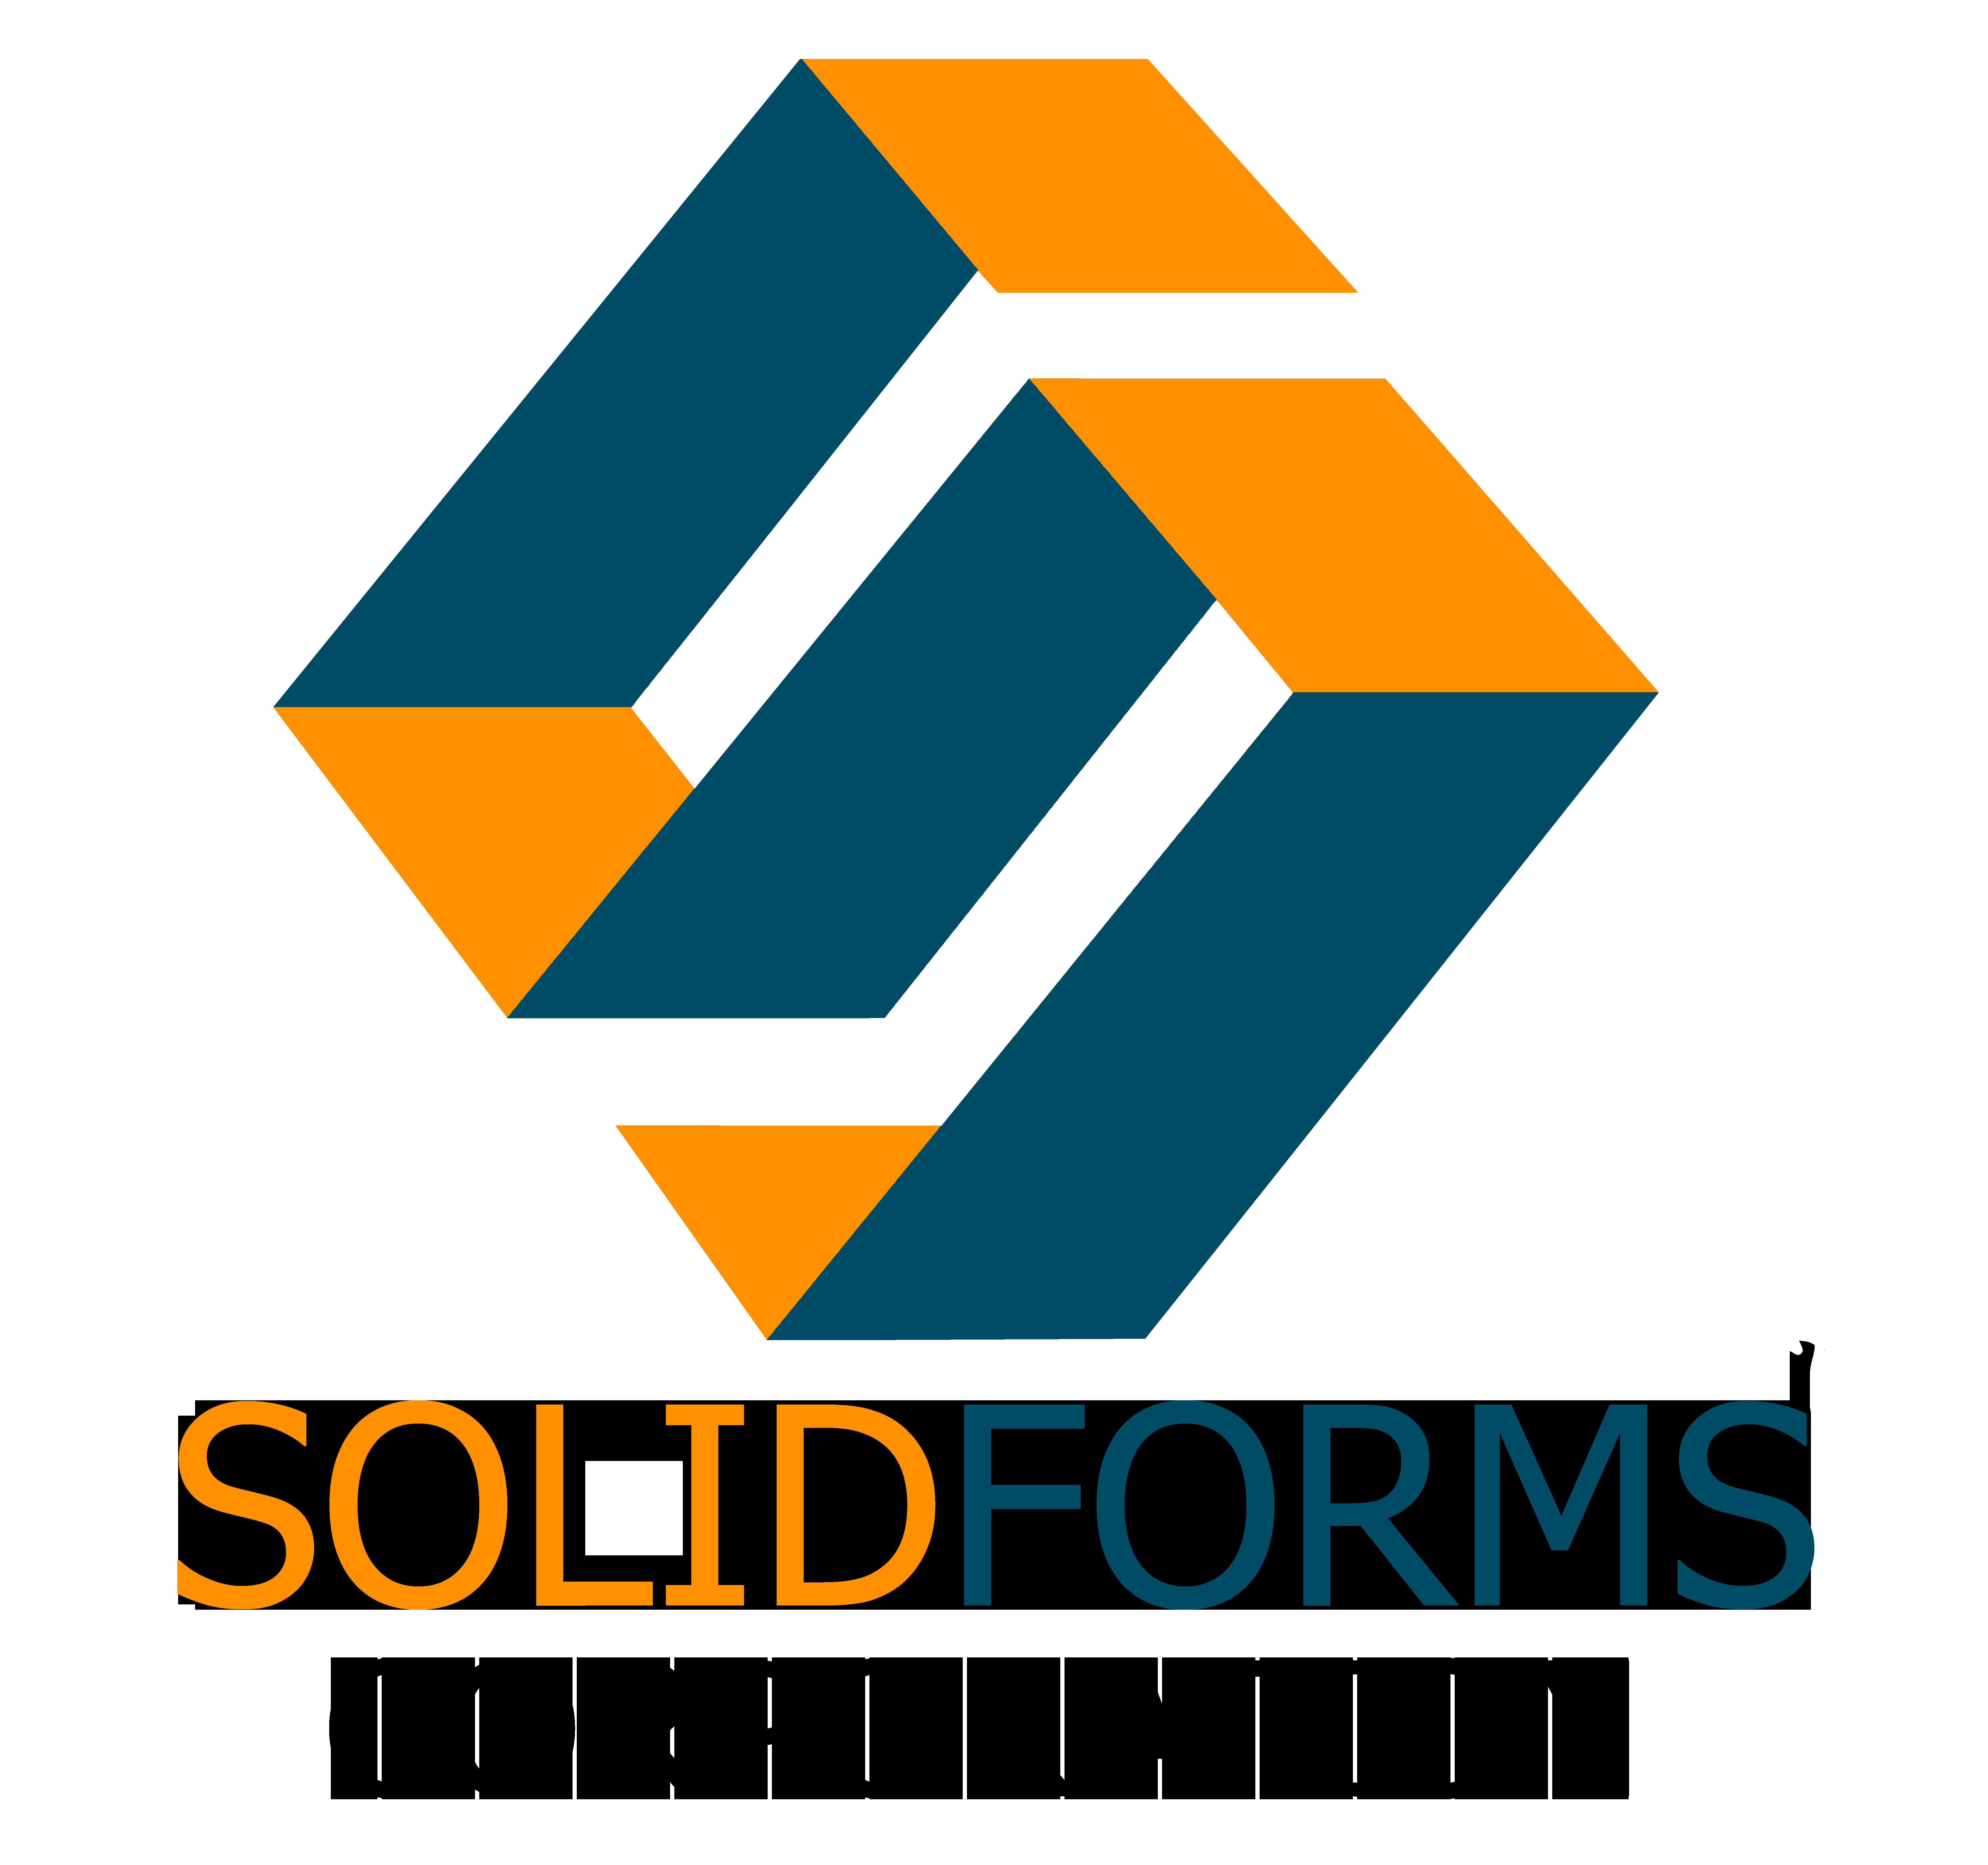 SolidForms Corporation